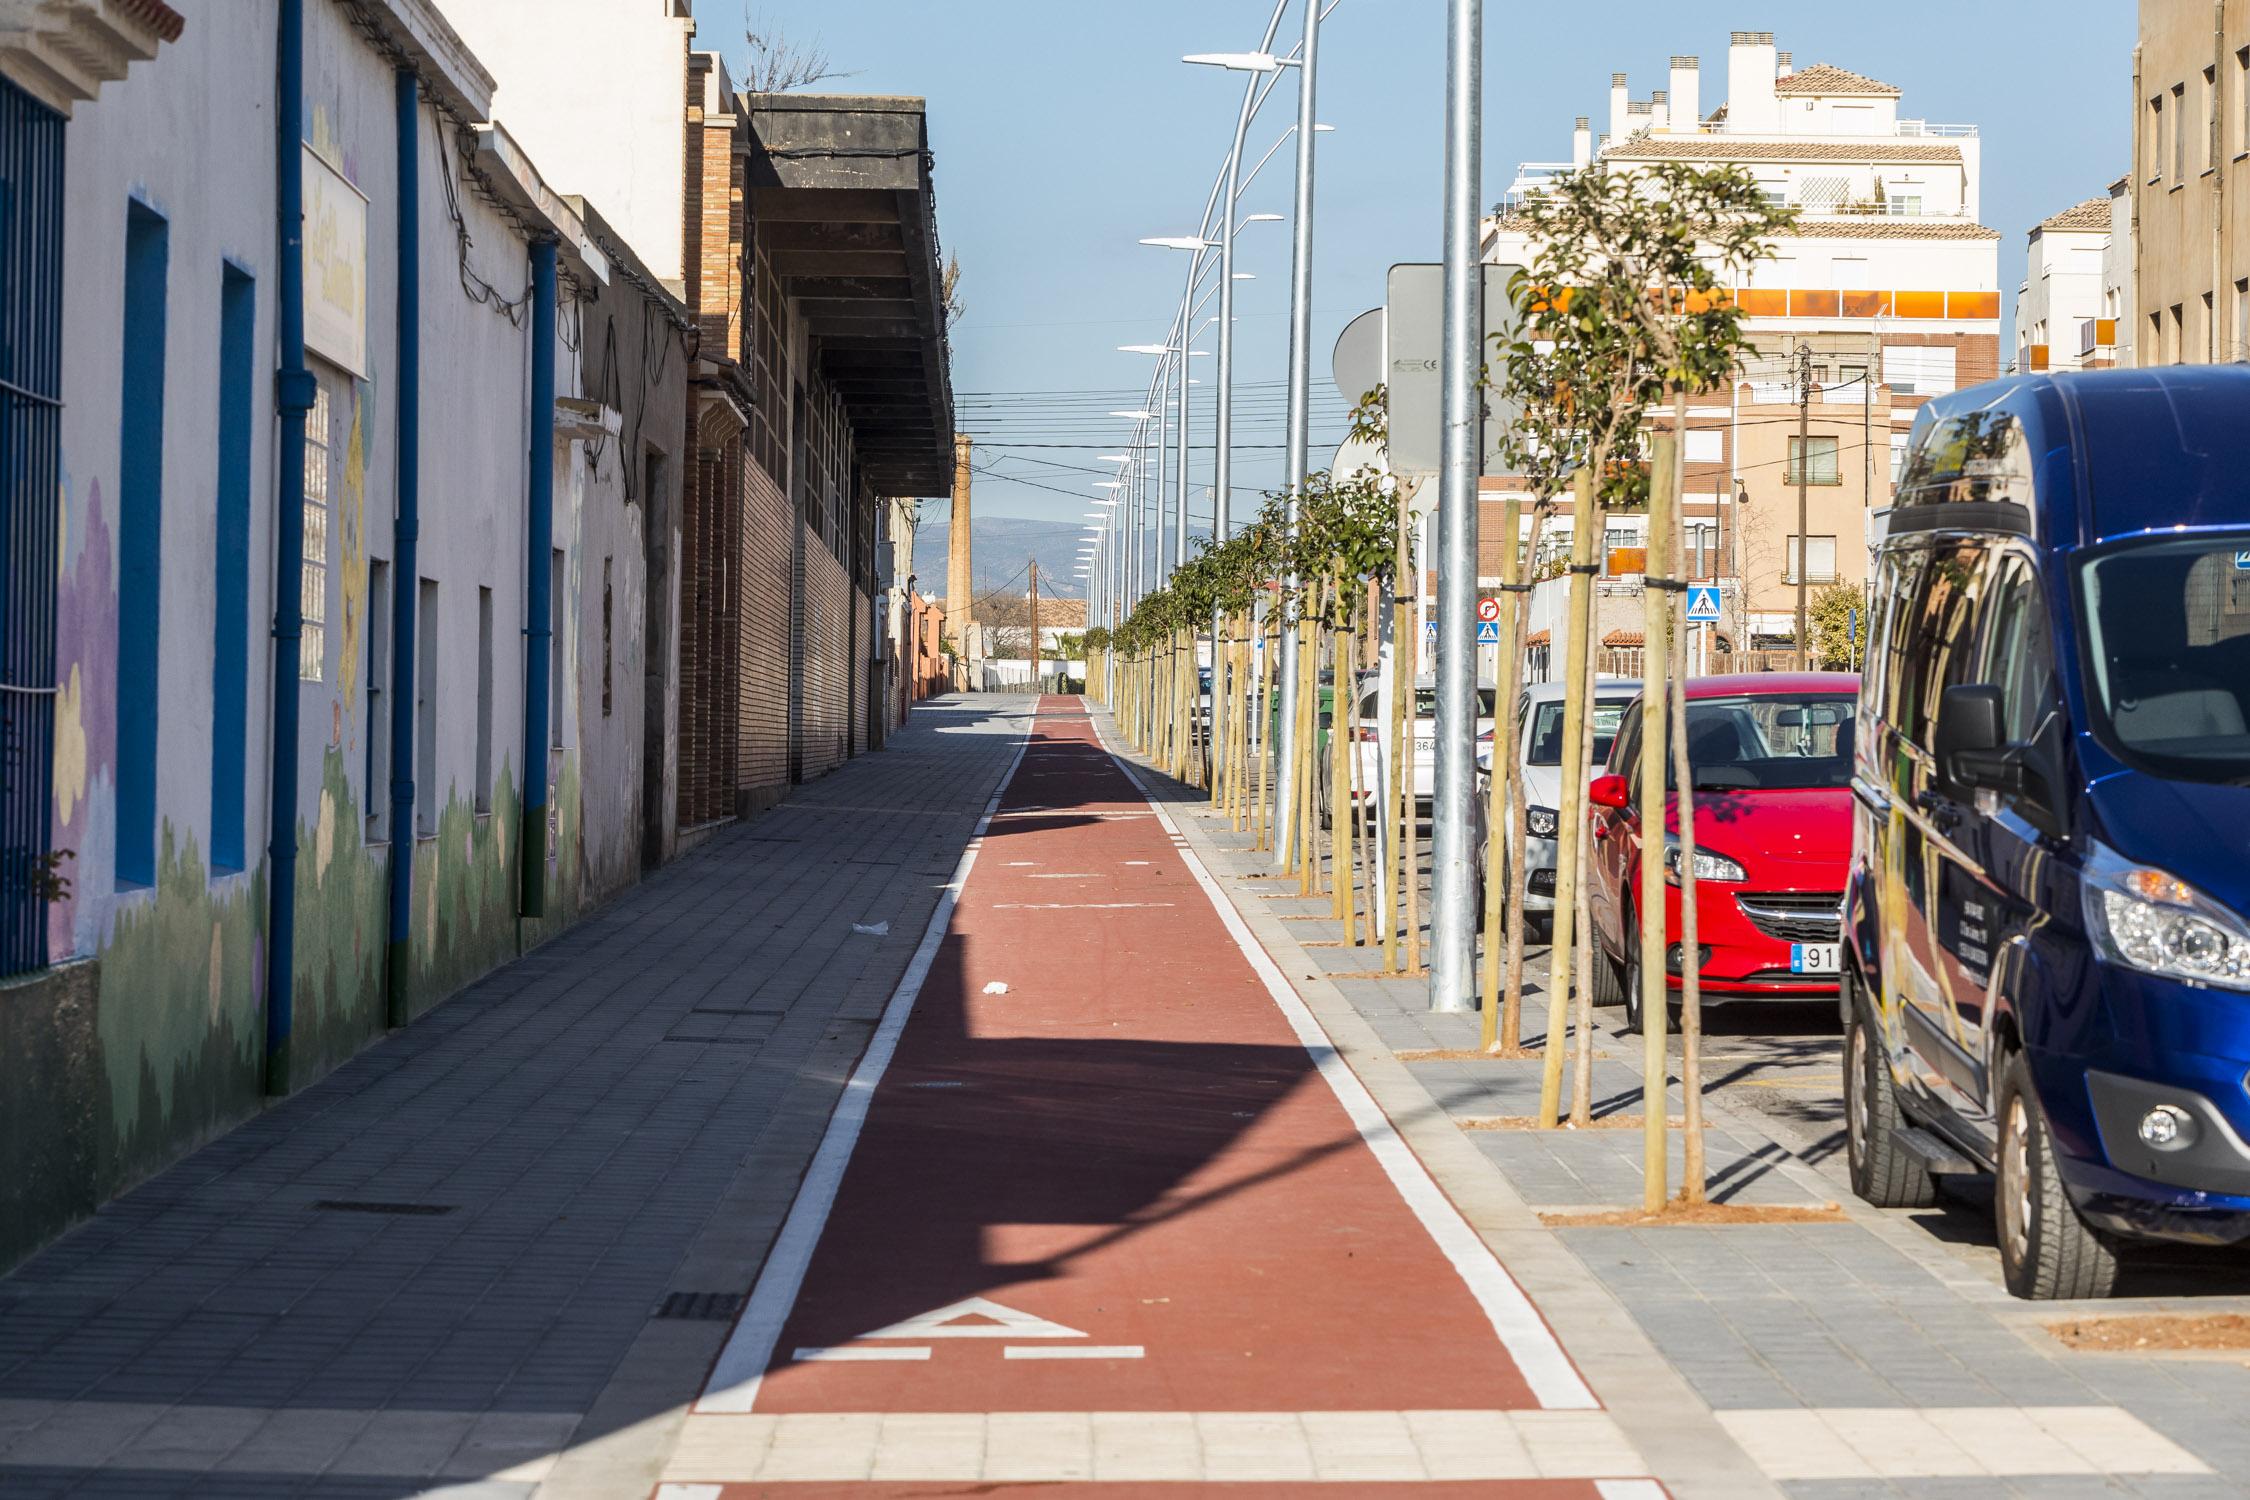 Seis empresas optan a reformar el bulevar San Jaime de Almassora